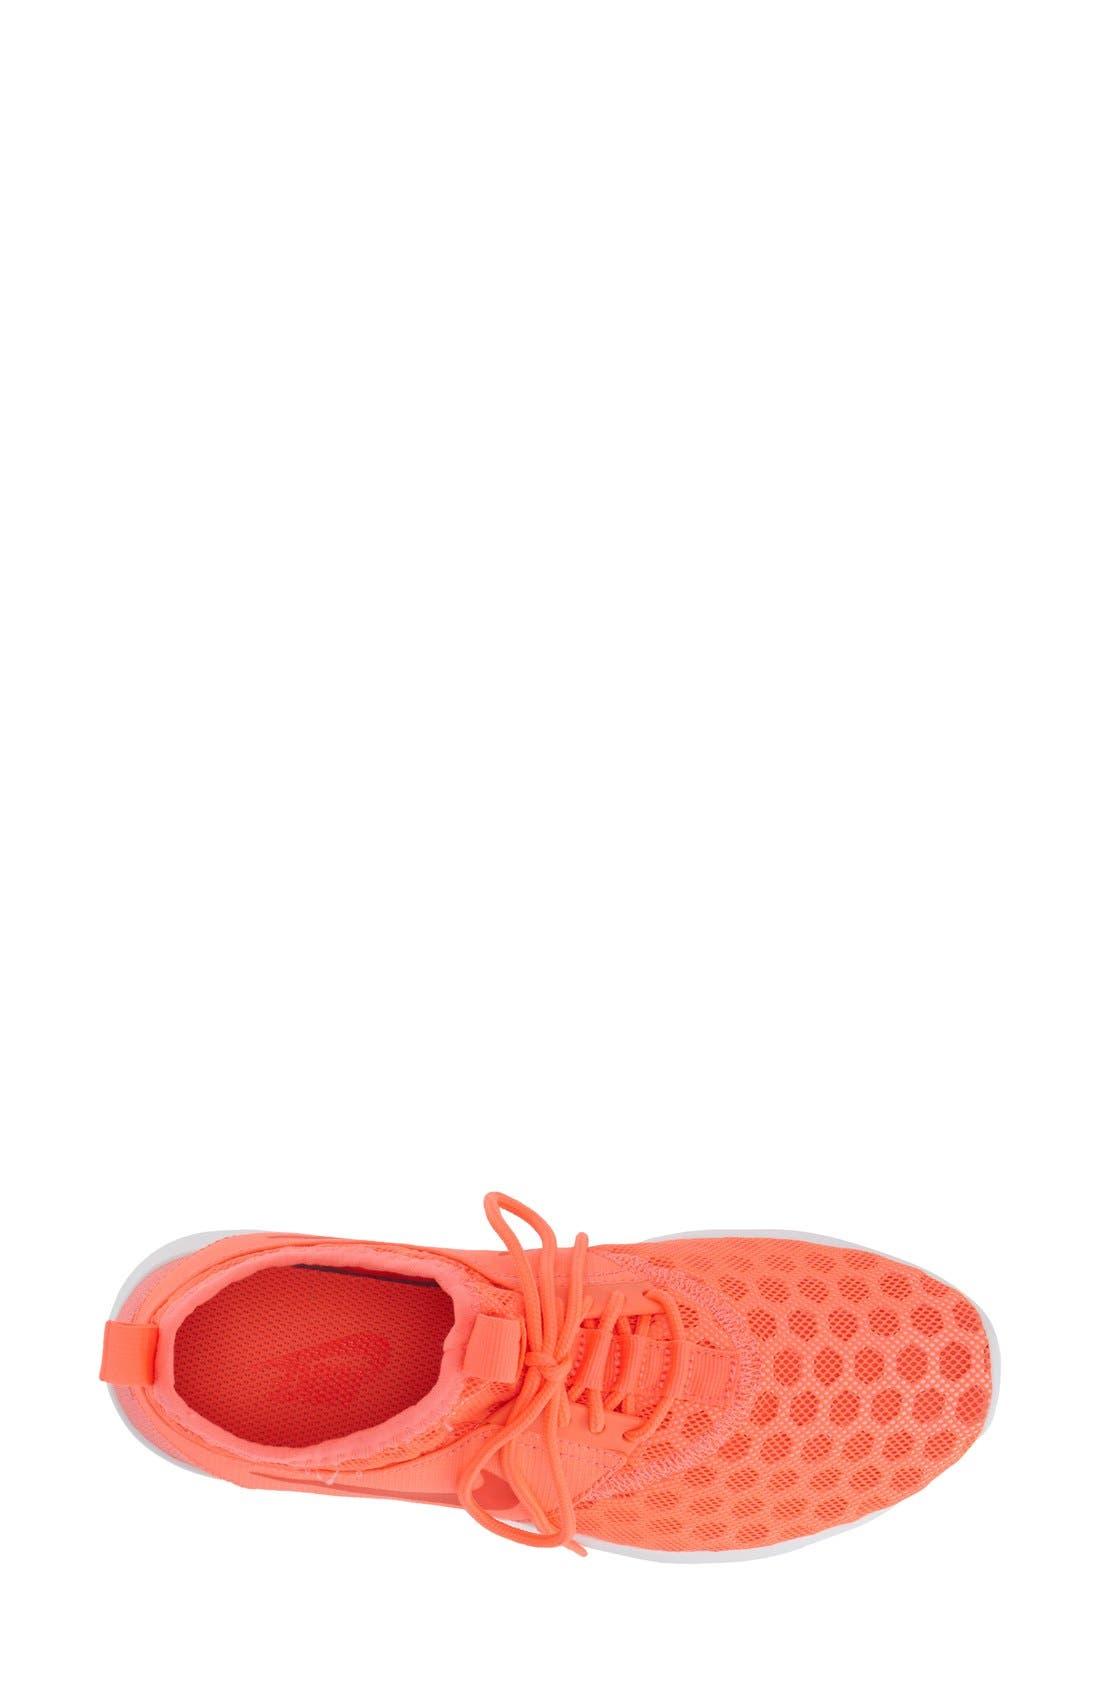 ,                             'Juvenate' Sneaker,                             Alternate thumbnail 292, color,                             800